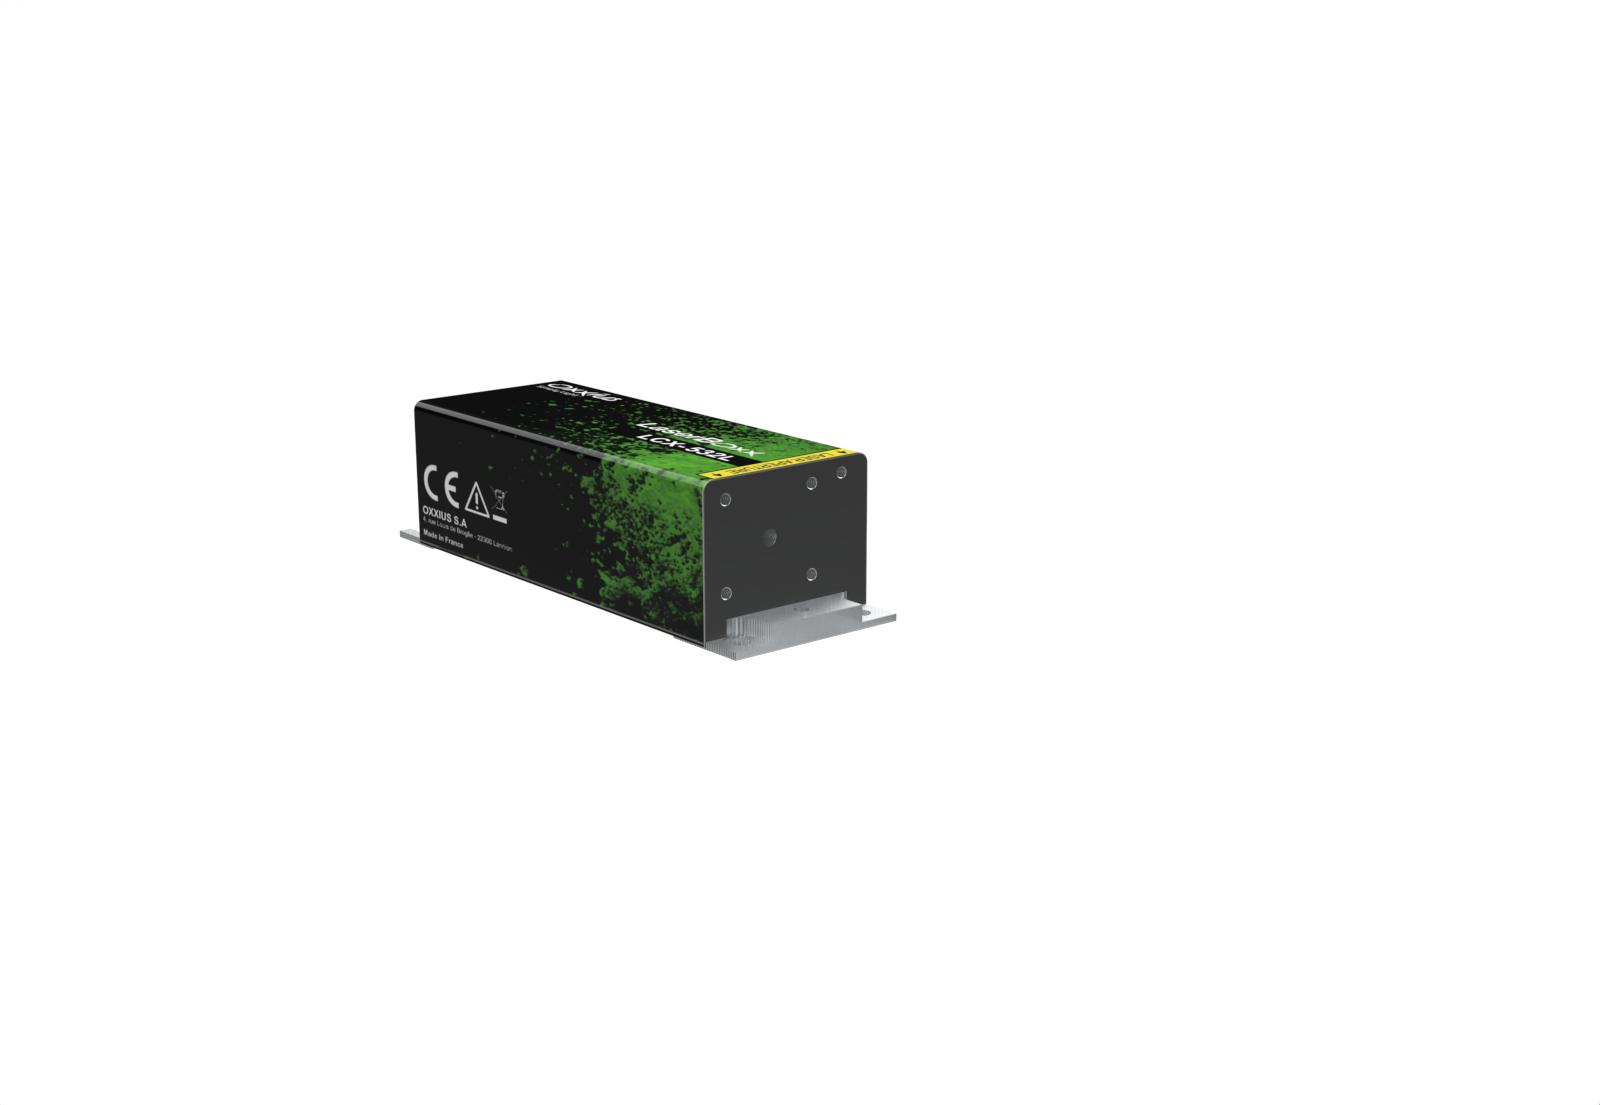 LCX-532S-100-COL: 532nm SLM DPSS Laser